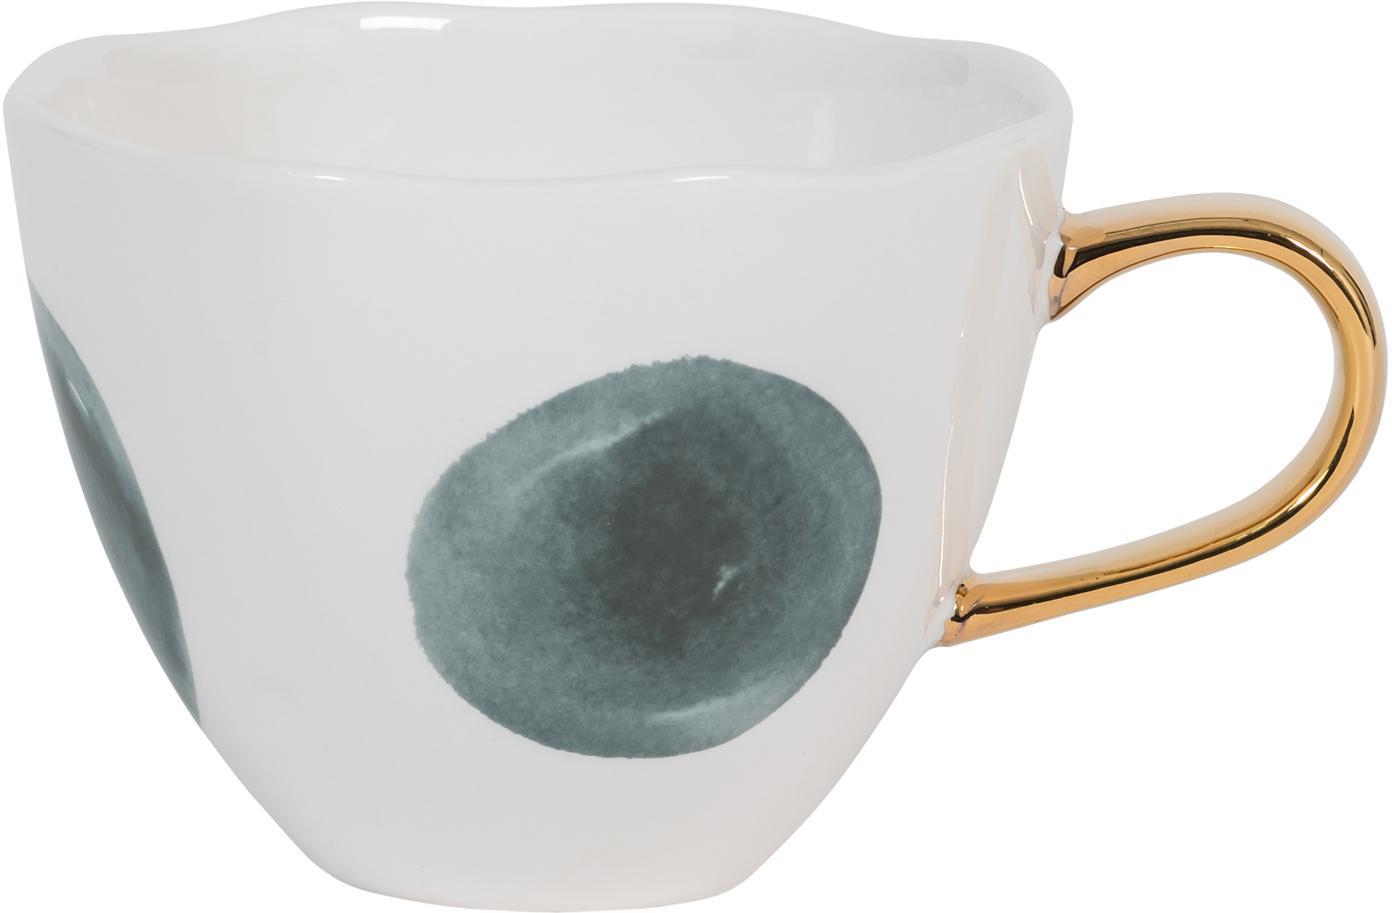 Tazza con manico dorato Good Morning, Terracotta, Bianco, blu, Ø 11 x Alt. 8 cm